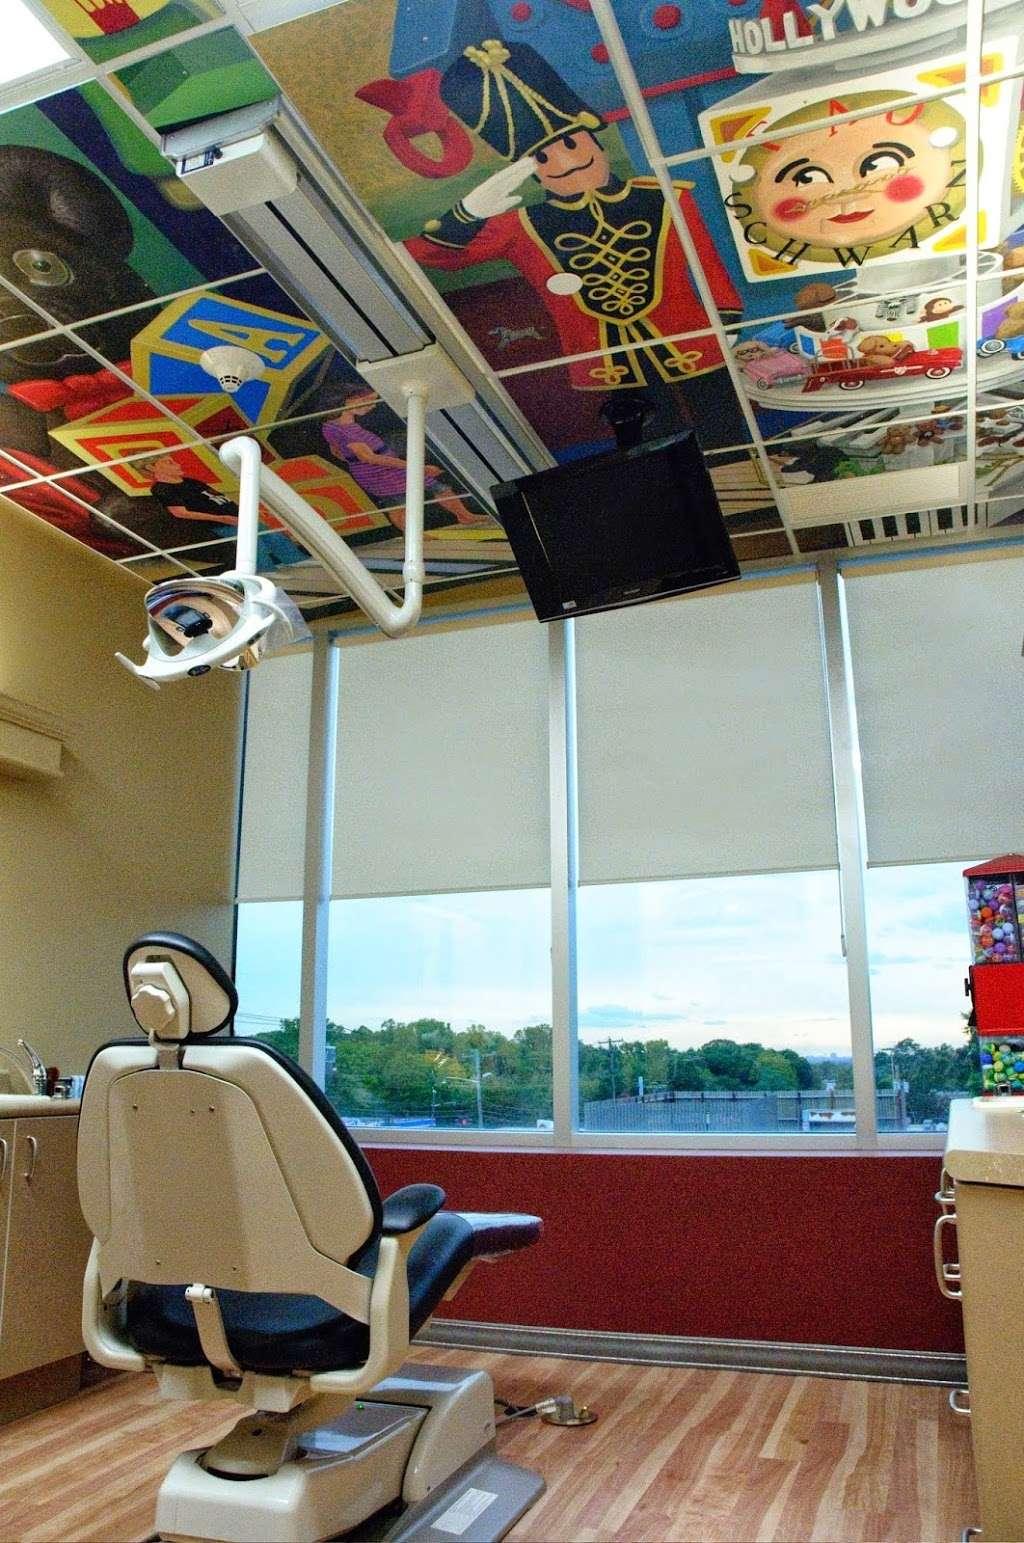 Kid Island Dental at Great Neck Dental Associates - dentist  | Photo 5 of 8 | Address: 611 Northern Blvd #100, Great Neck, NY 11021, USA | Phone: (516) 487-5500